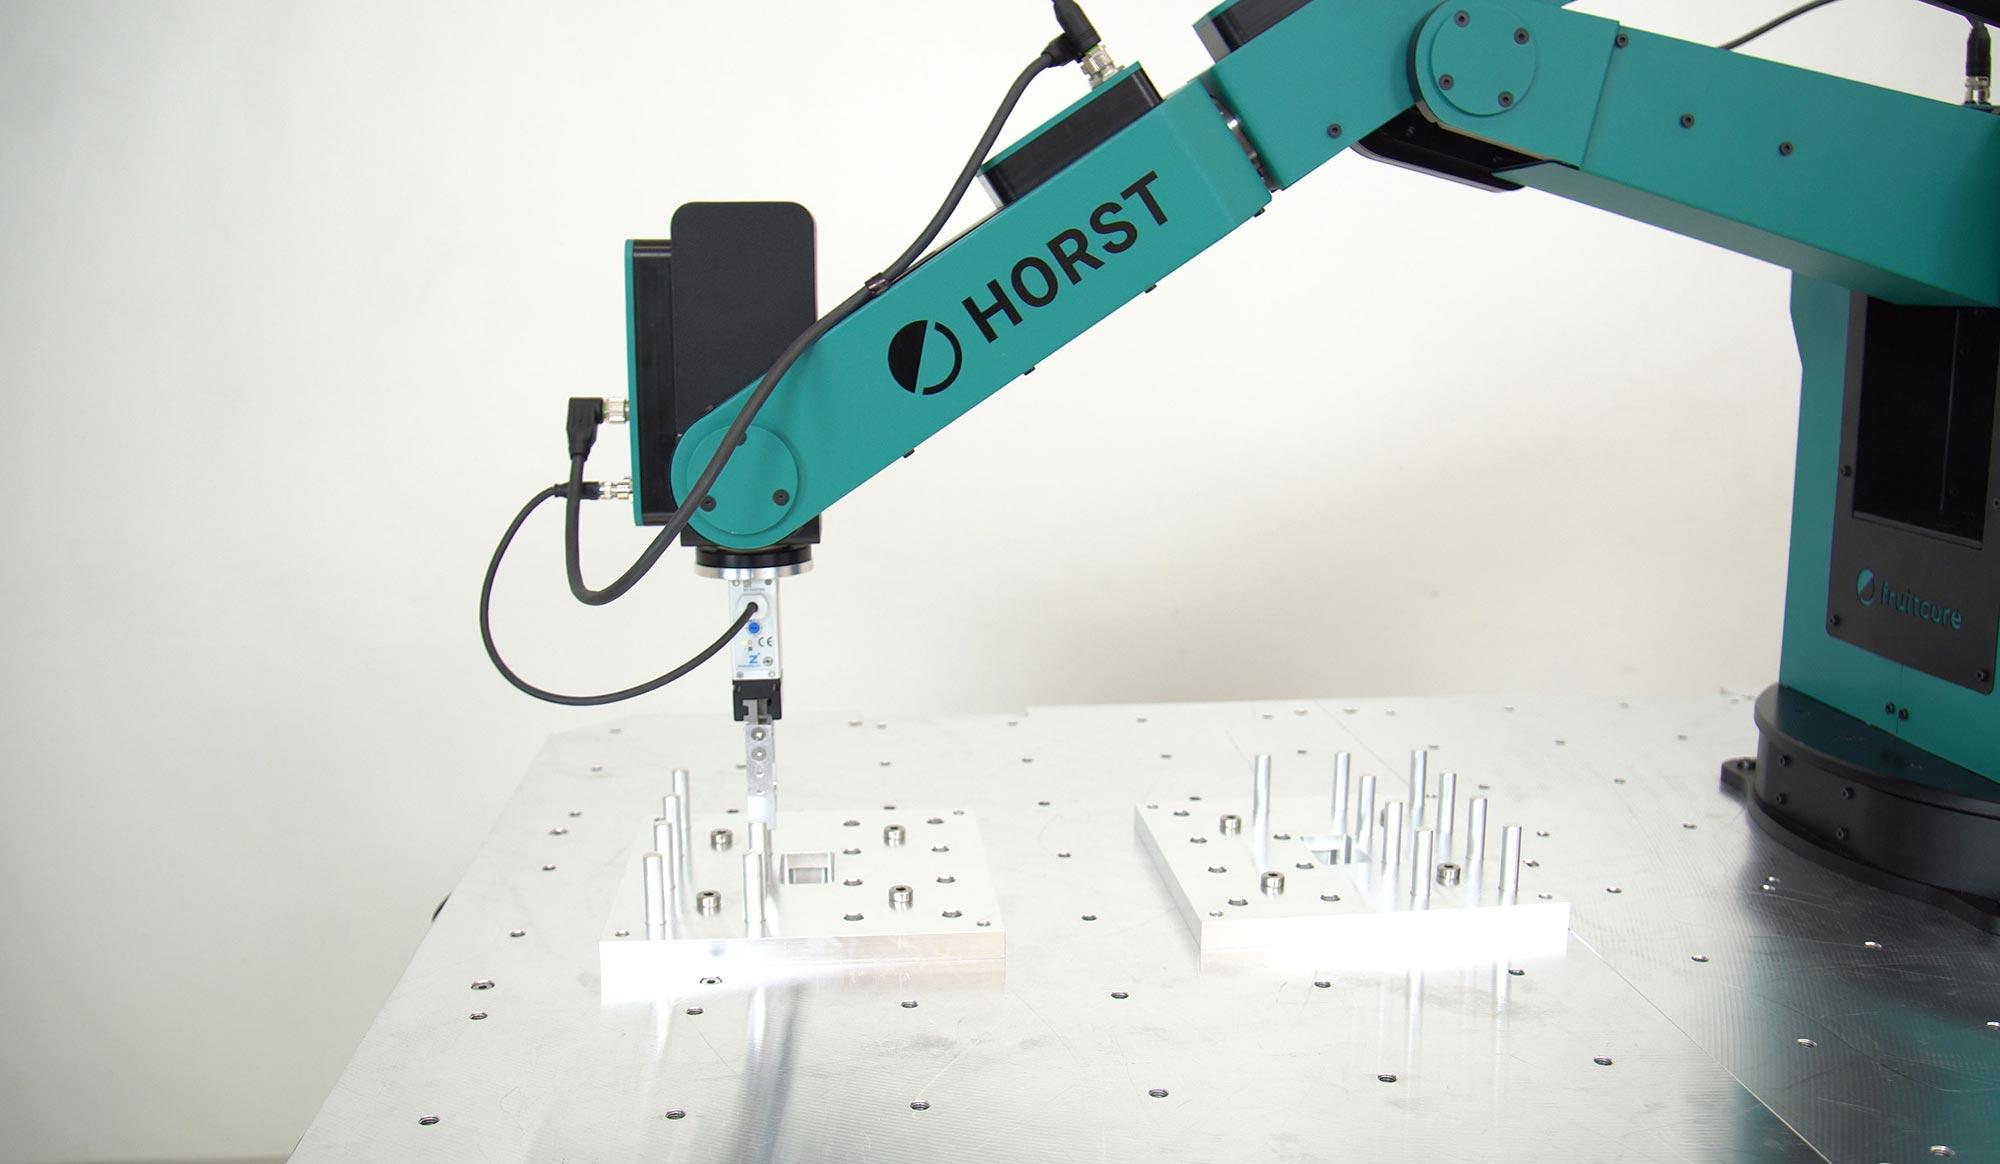 fruitcore-robotics-Palettieren